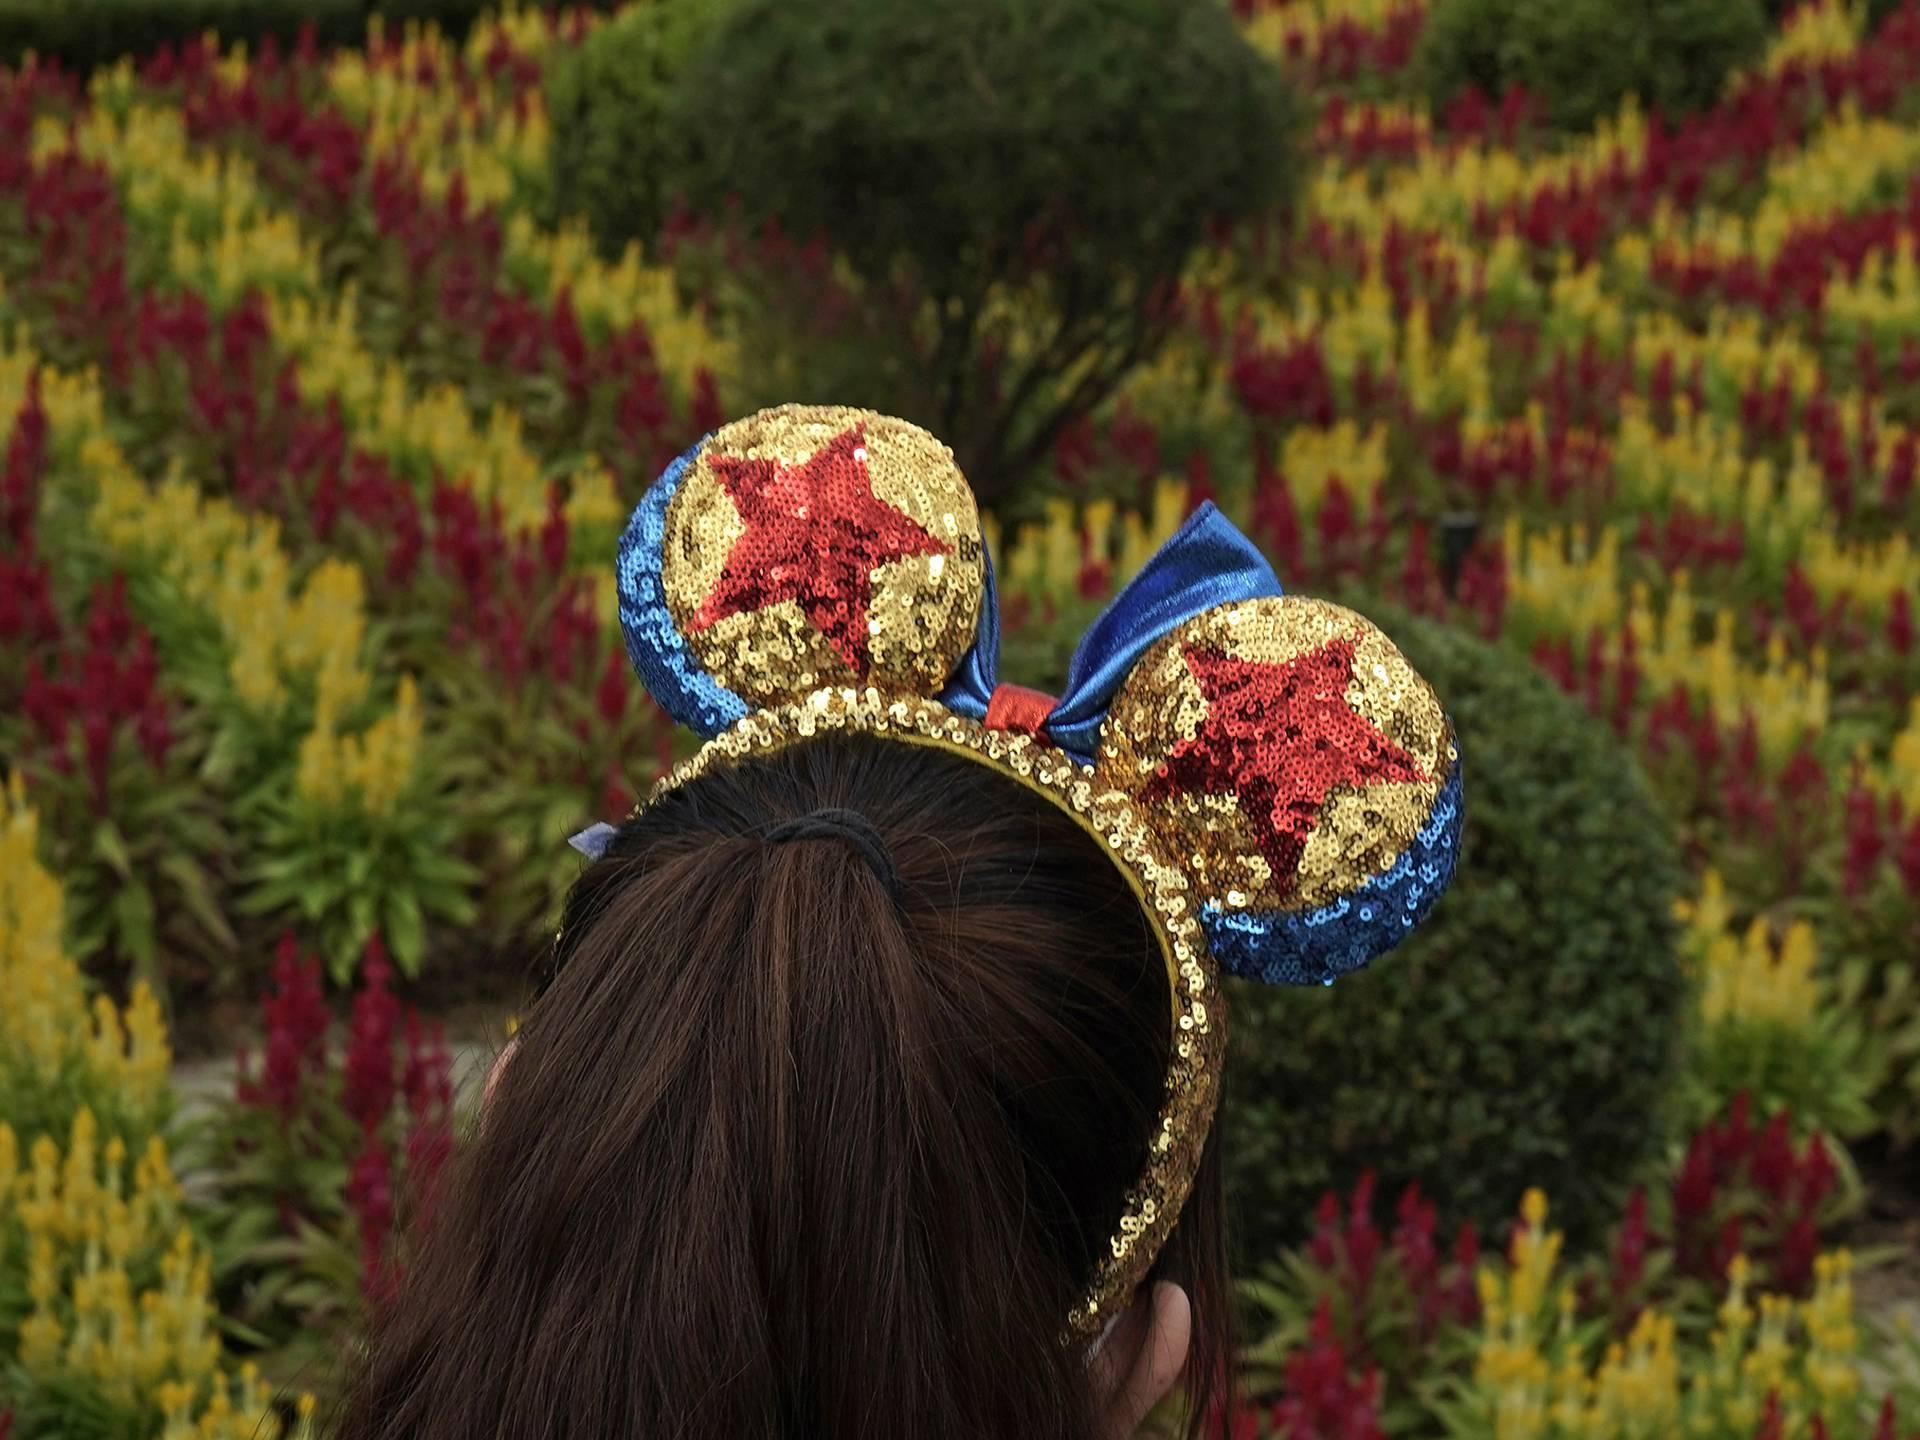 Una visitante usa un sombrero con las icónicas orejas de Mickey Mouse en Hong Kong Disneyland. (AP Photo/Kin Cheung)